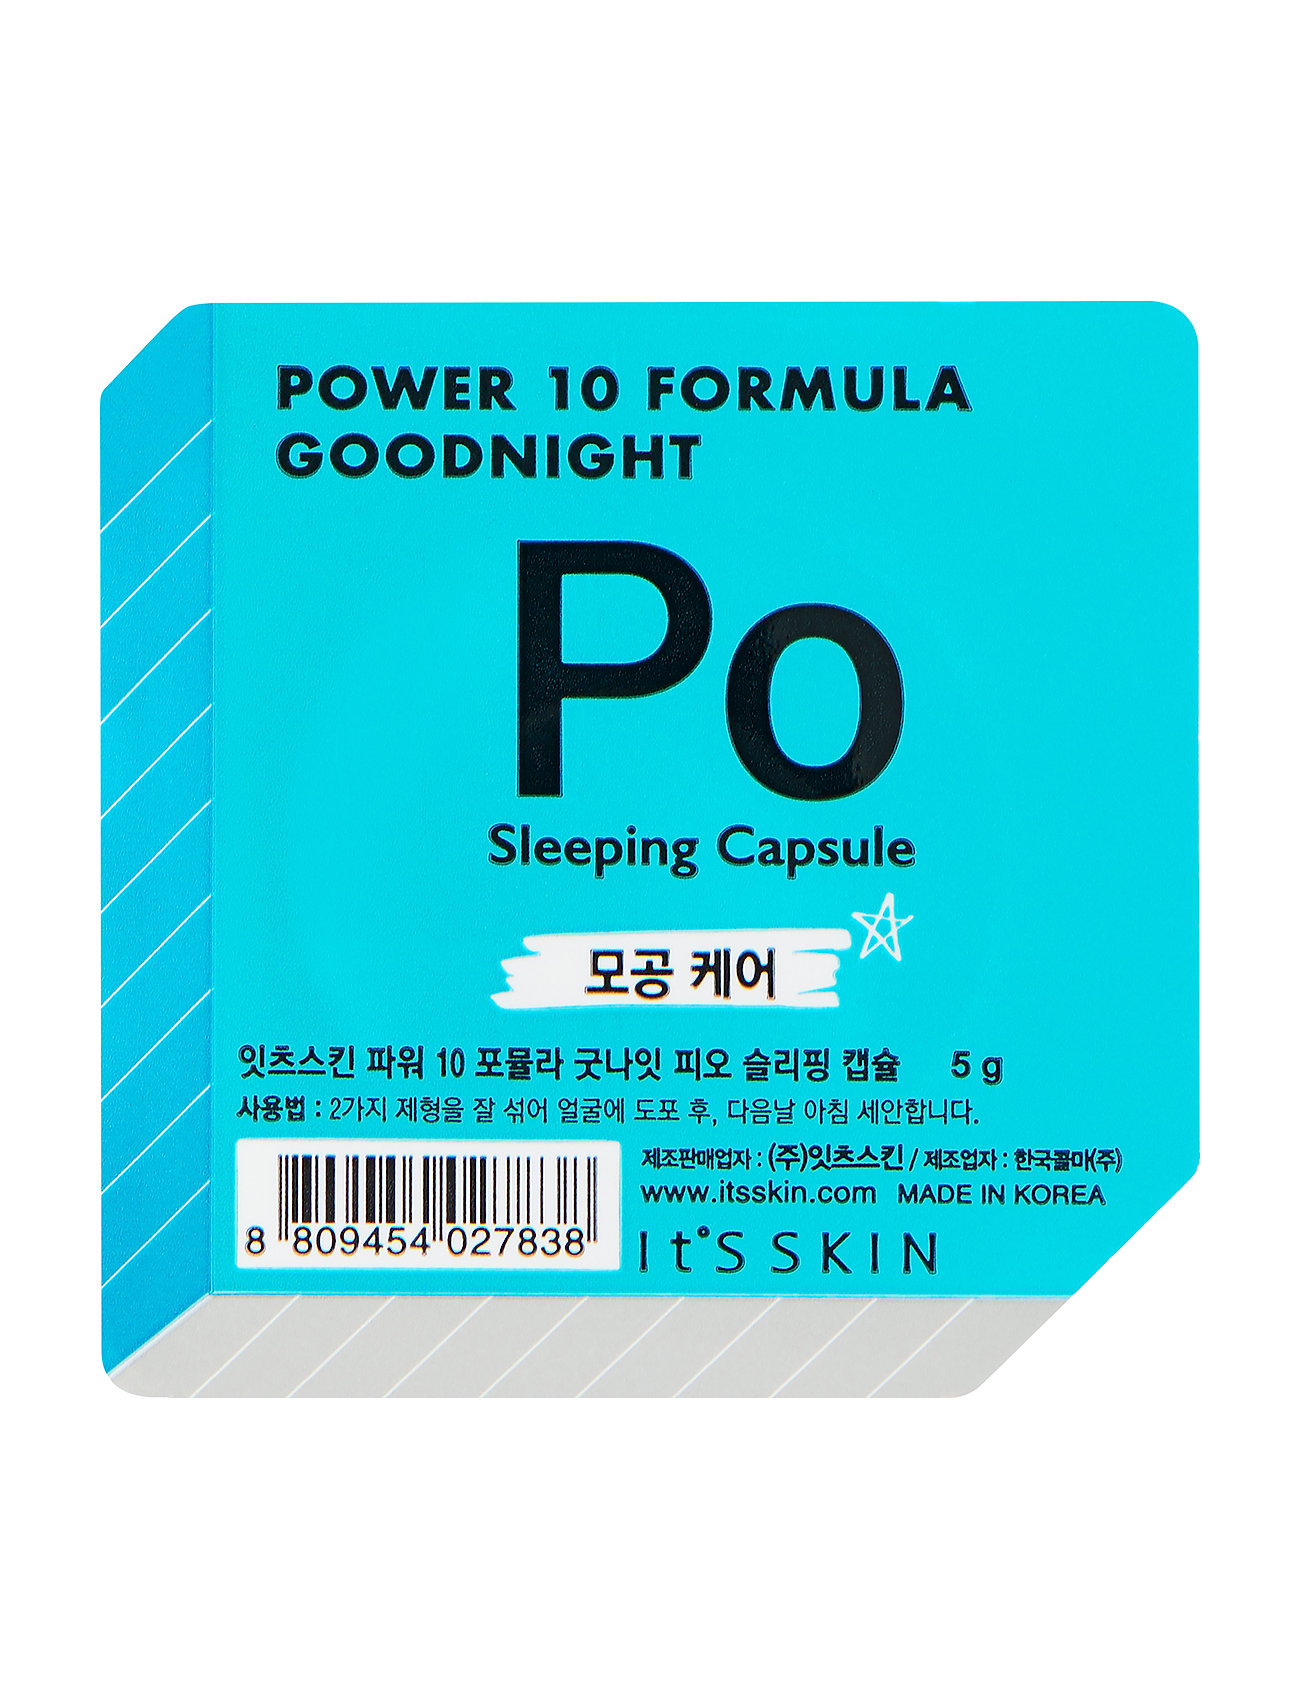 Image of It'S Skin Formula Goodnight Sleeping Capsule Po Beauty WOMEN Skin Care Face Moisturizers Night Cream Nude It'S SKIN (3158644441)